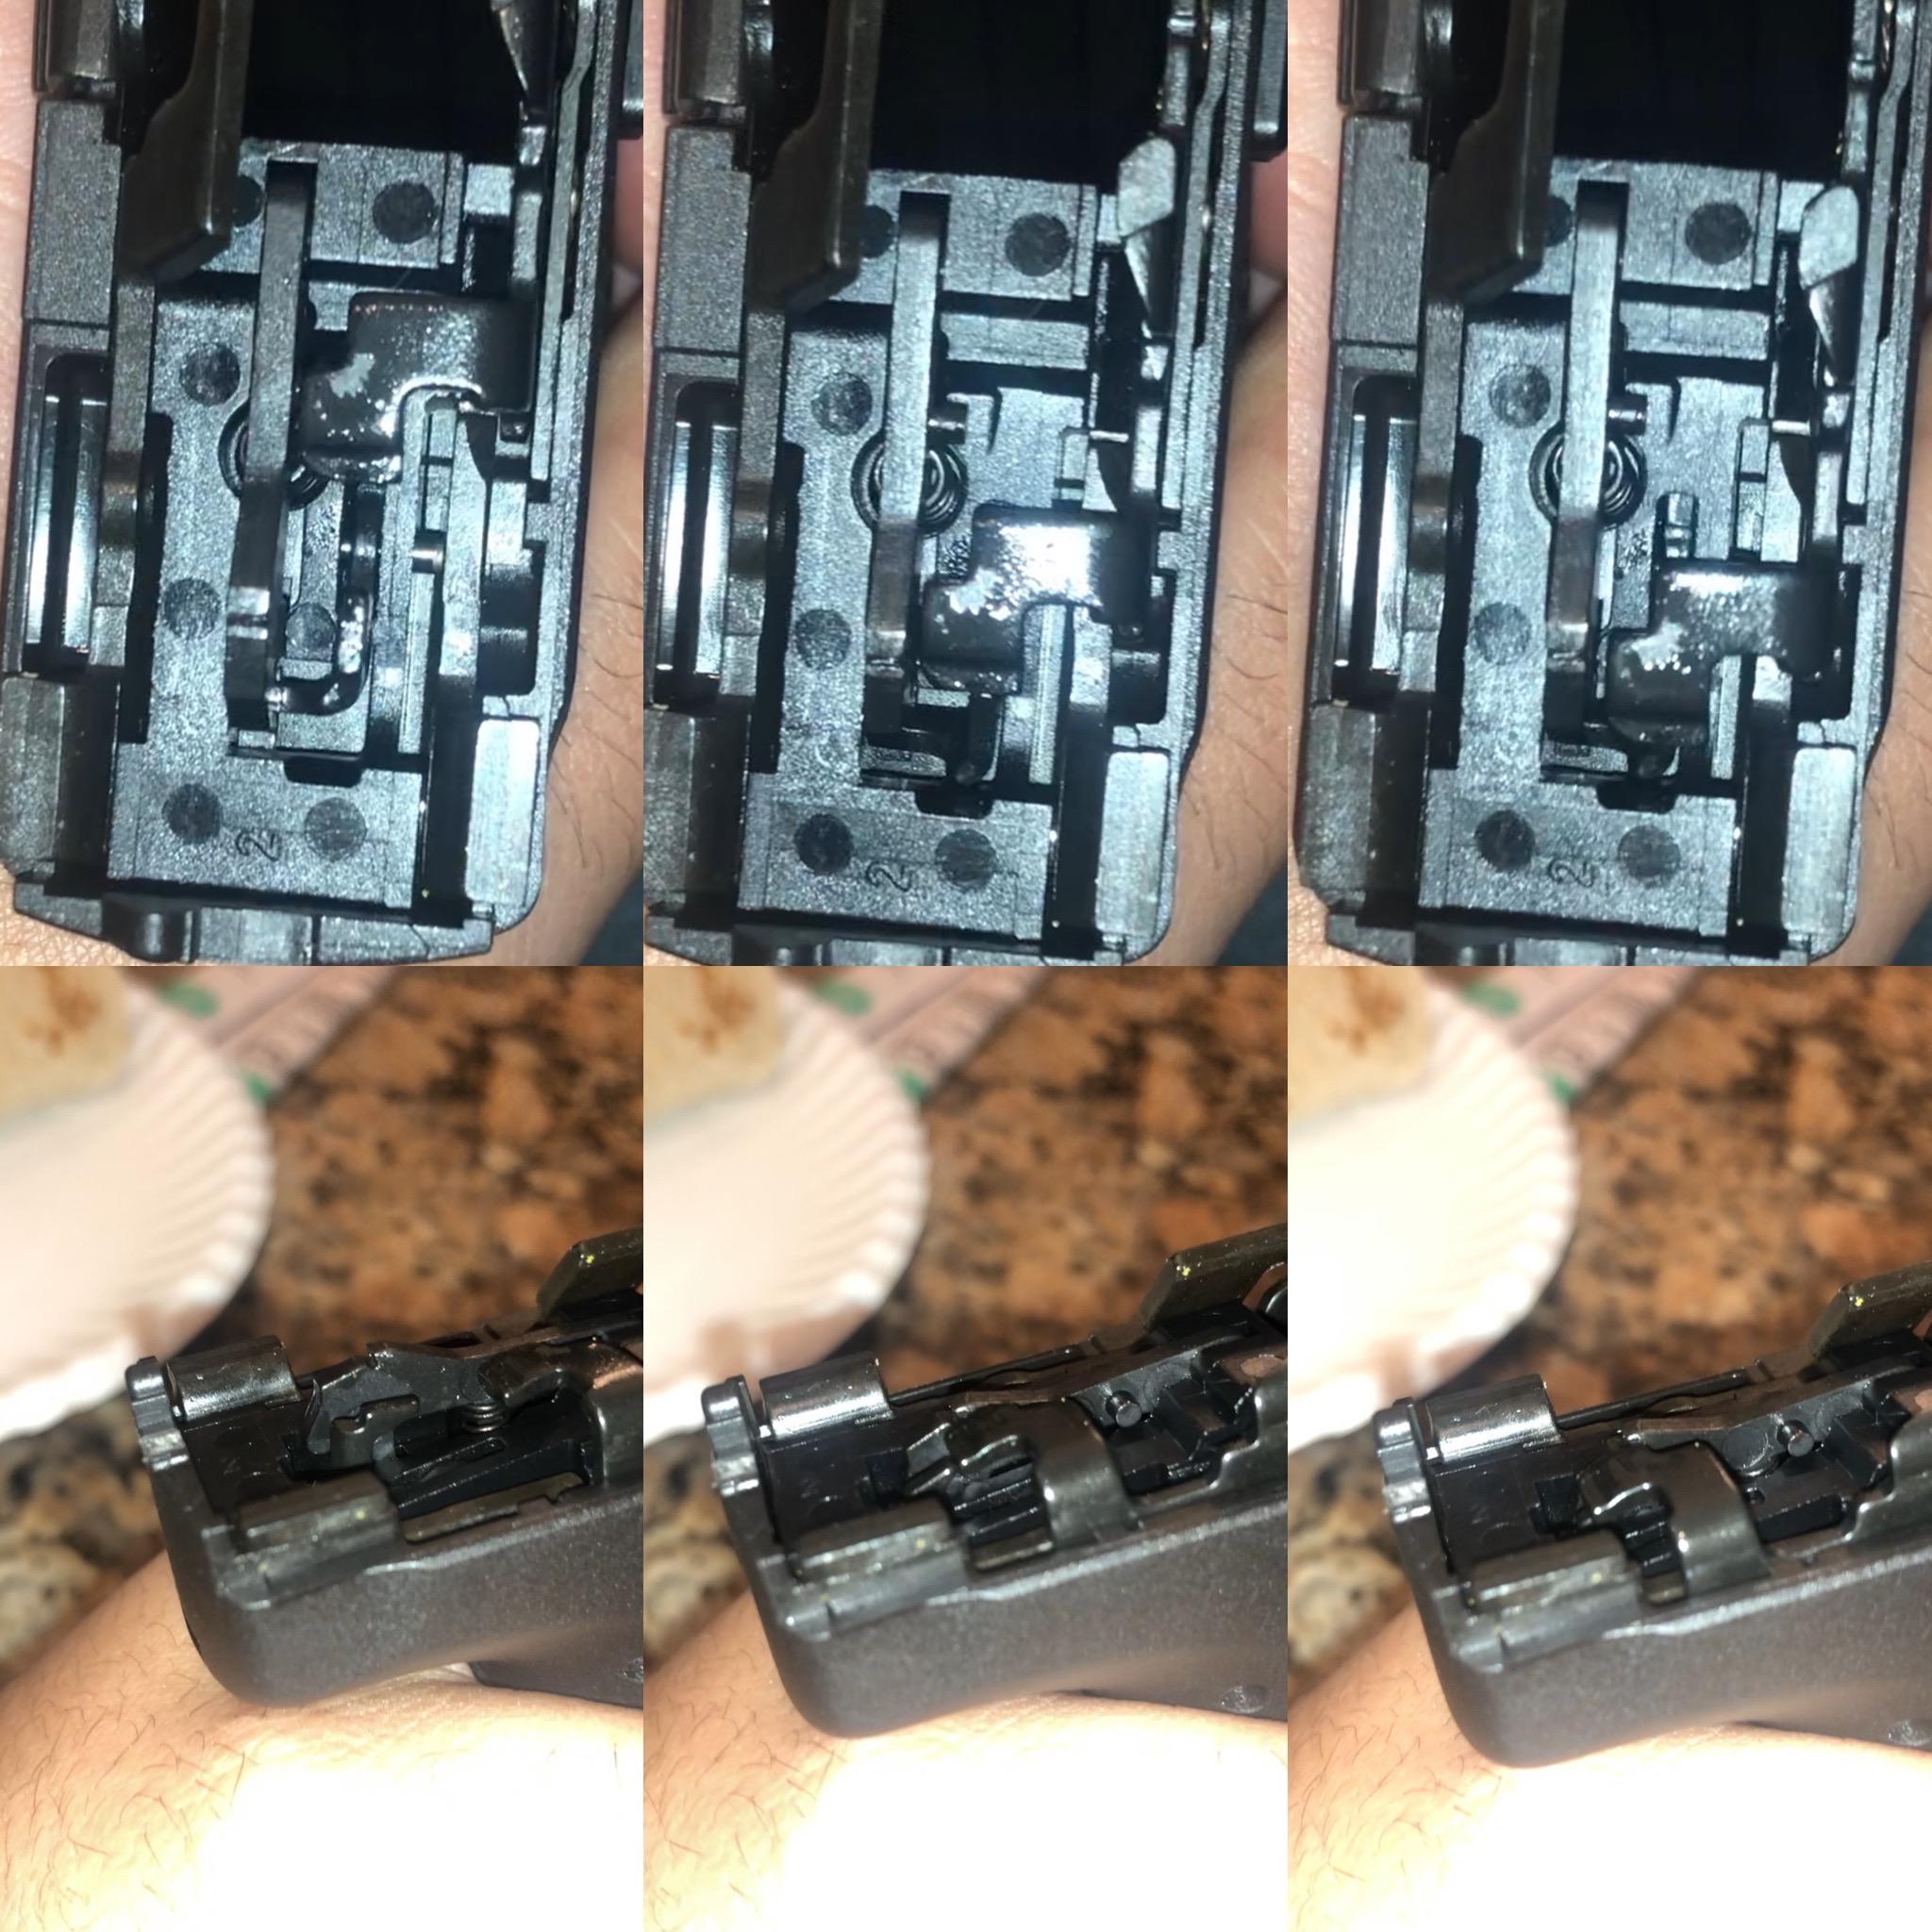 VP9 Reset Issue: Trigger overextends past break-30820836-9be4-4f4f-8f46-2523793e3dea.jpg